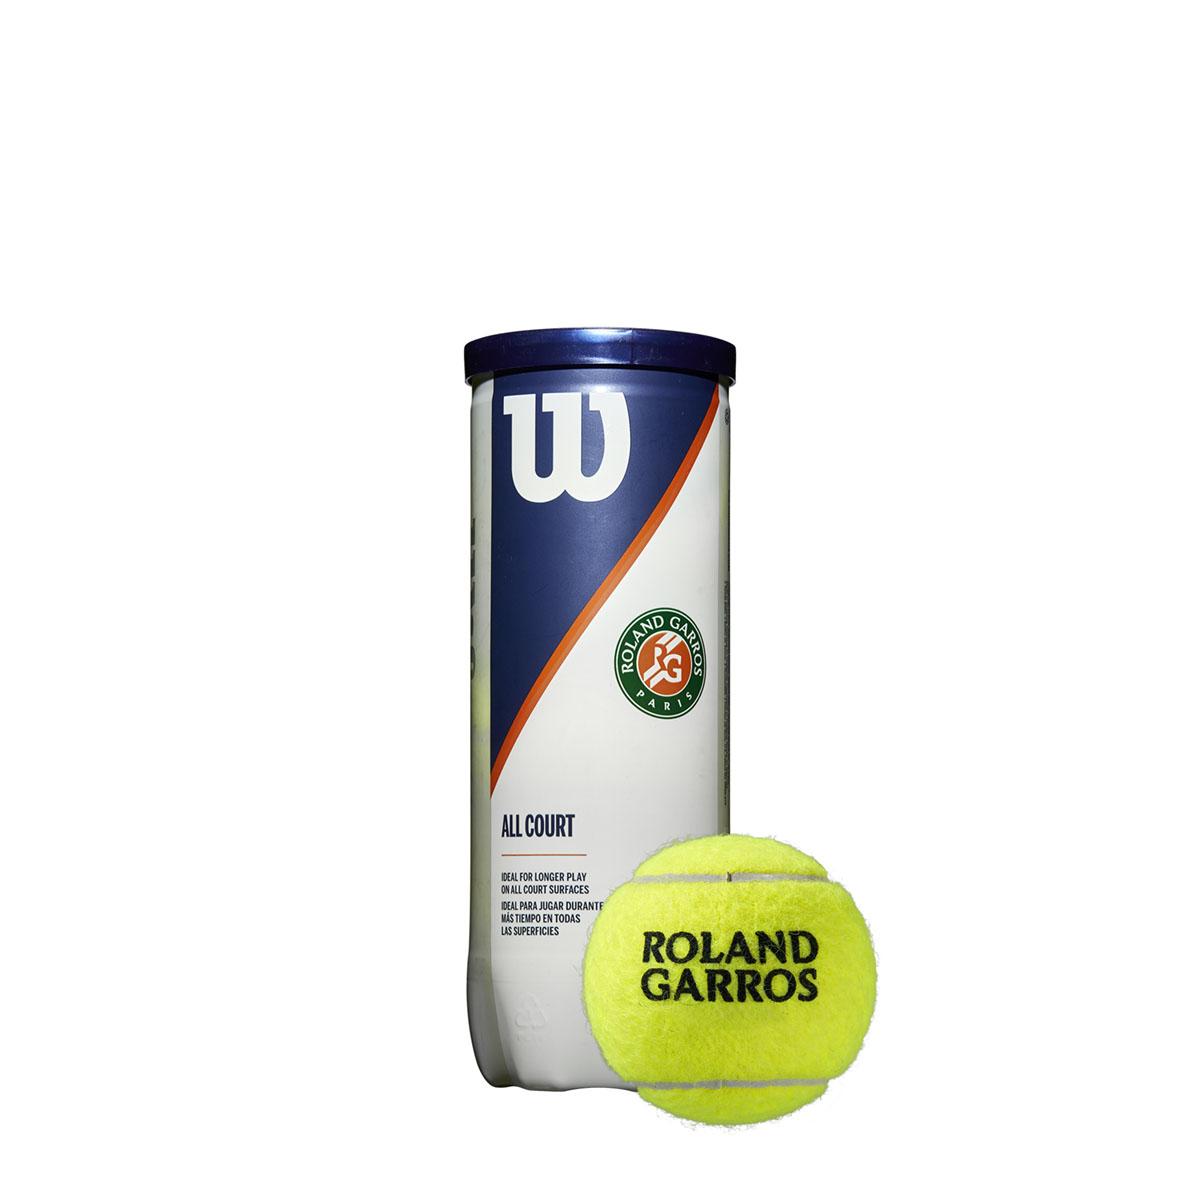 WRT126400_4_Roland_Garros_All_Court_3_Ball_Can_Clay_BU_Donut_Cap_w_Ball